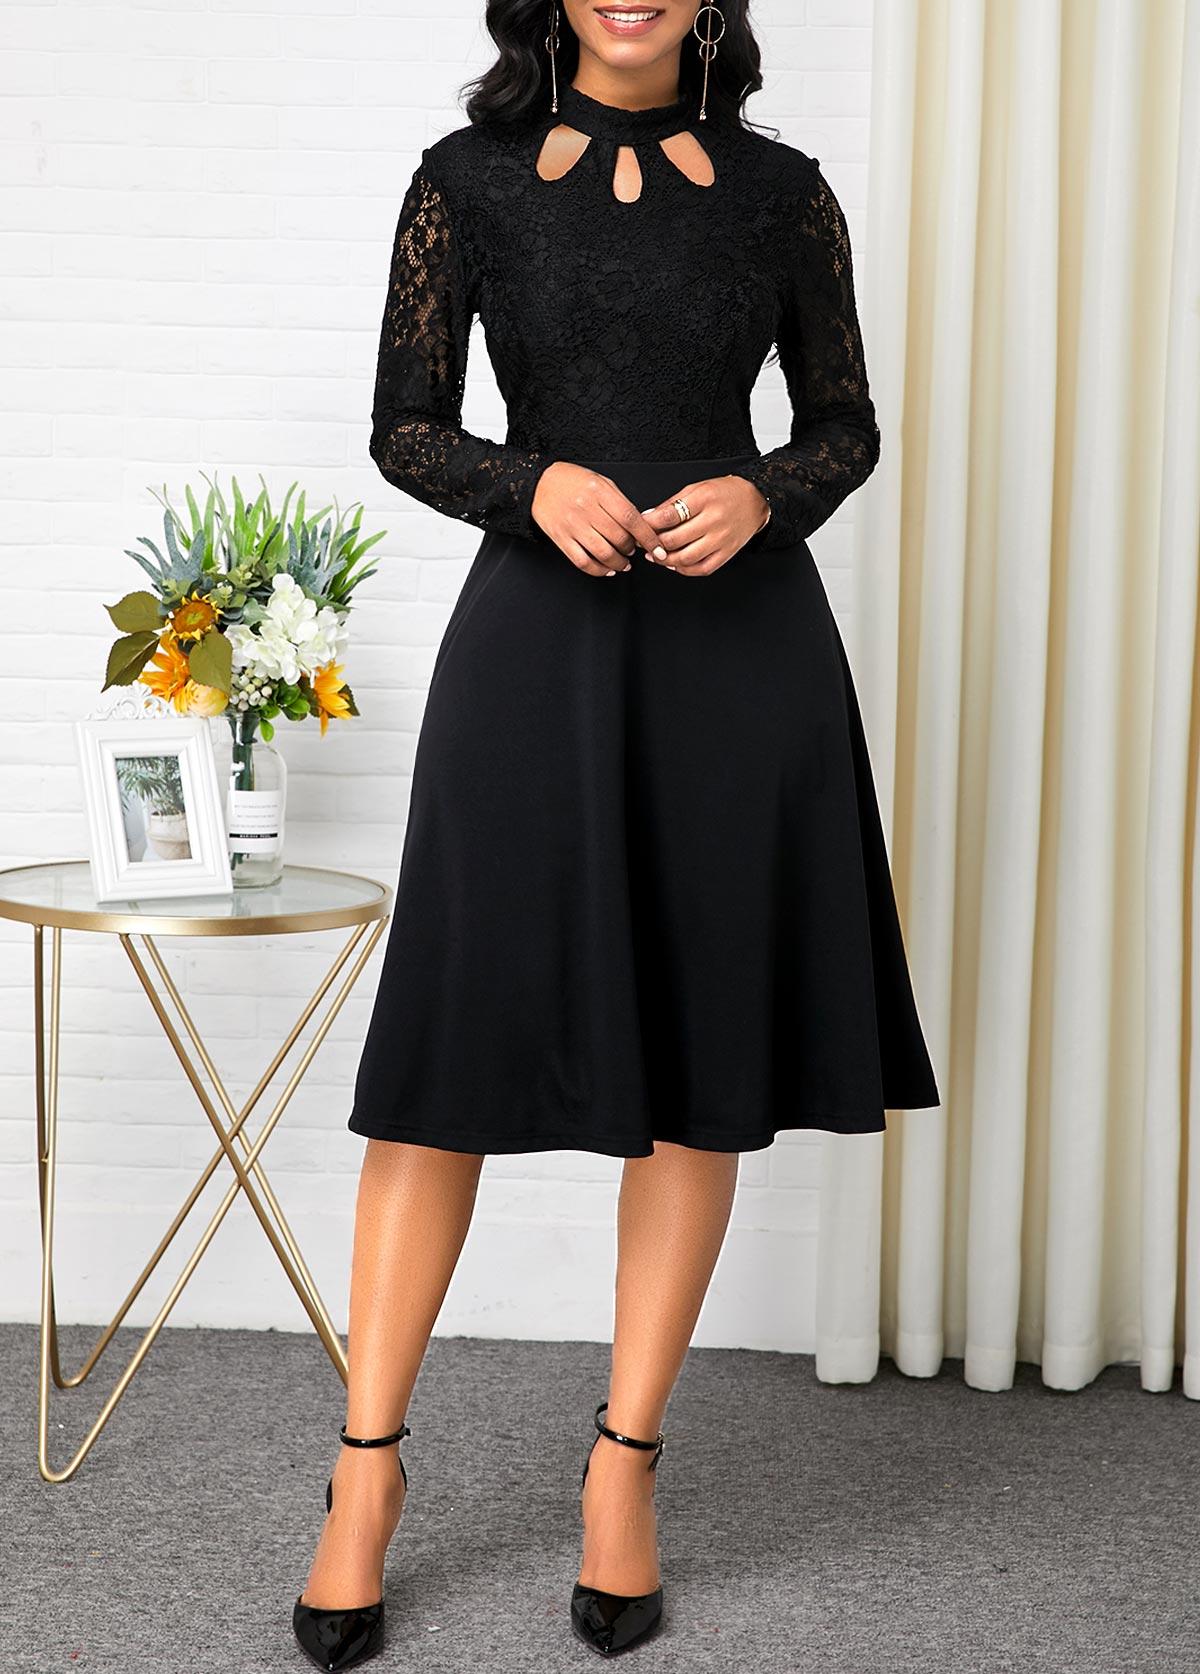 Long Sleeve Black Lace Patchwork Dress